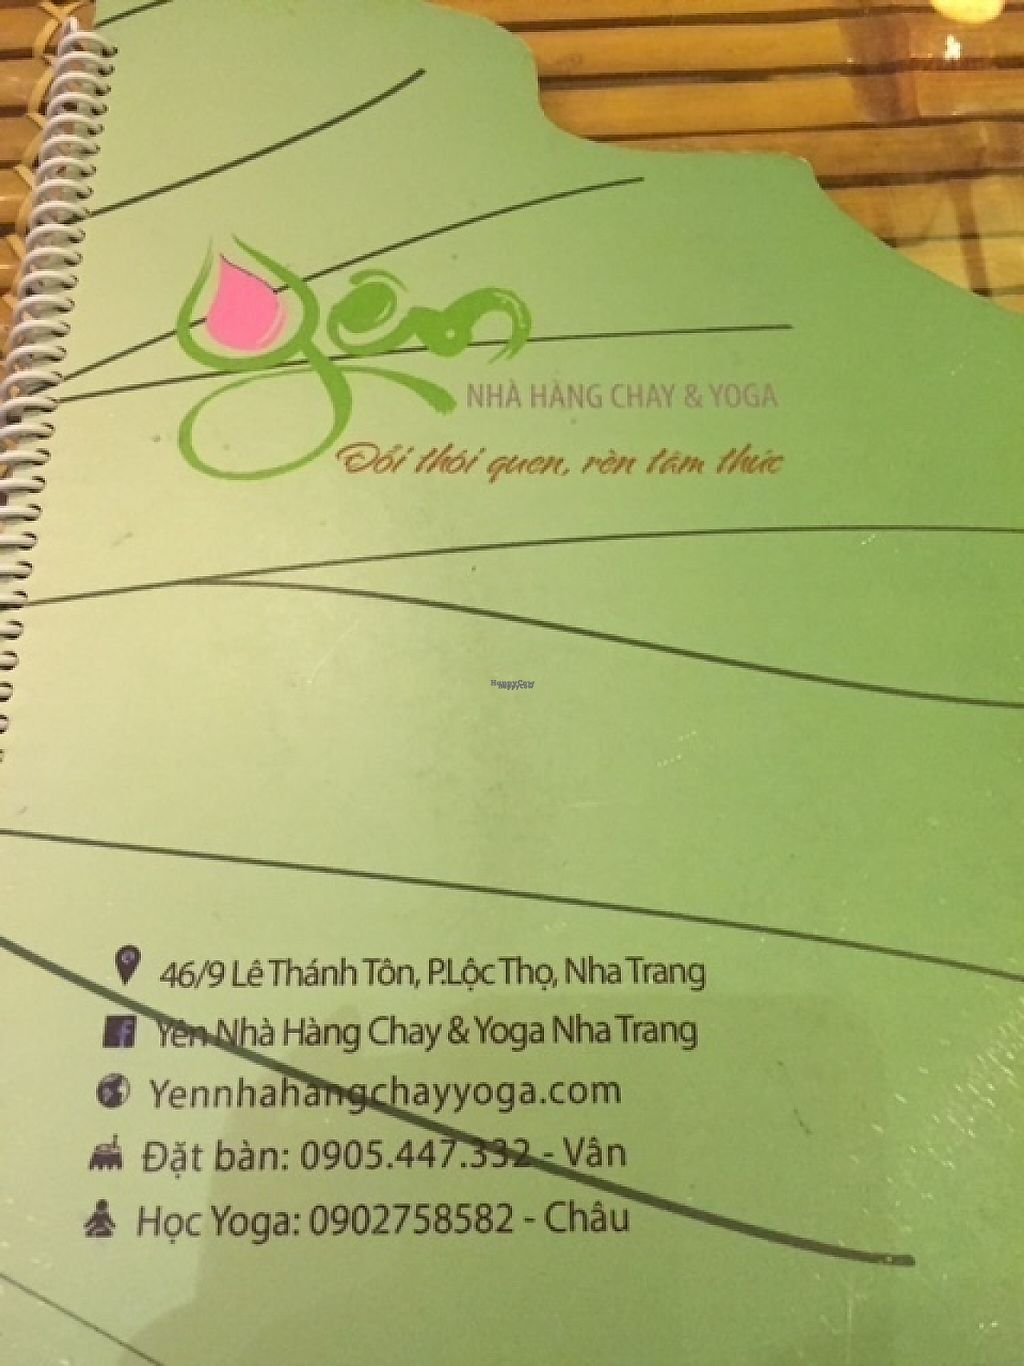 "Photo of Yén Nha Hang Chay & Yoga  by <a href=""/members/profile/UrbanFarm"">UrbanFarm</a> <br/>Menu Cover <br/> January 3, 2017  - <a href='/contact/abuse/image/84735/207383'>Report</a>"